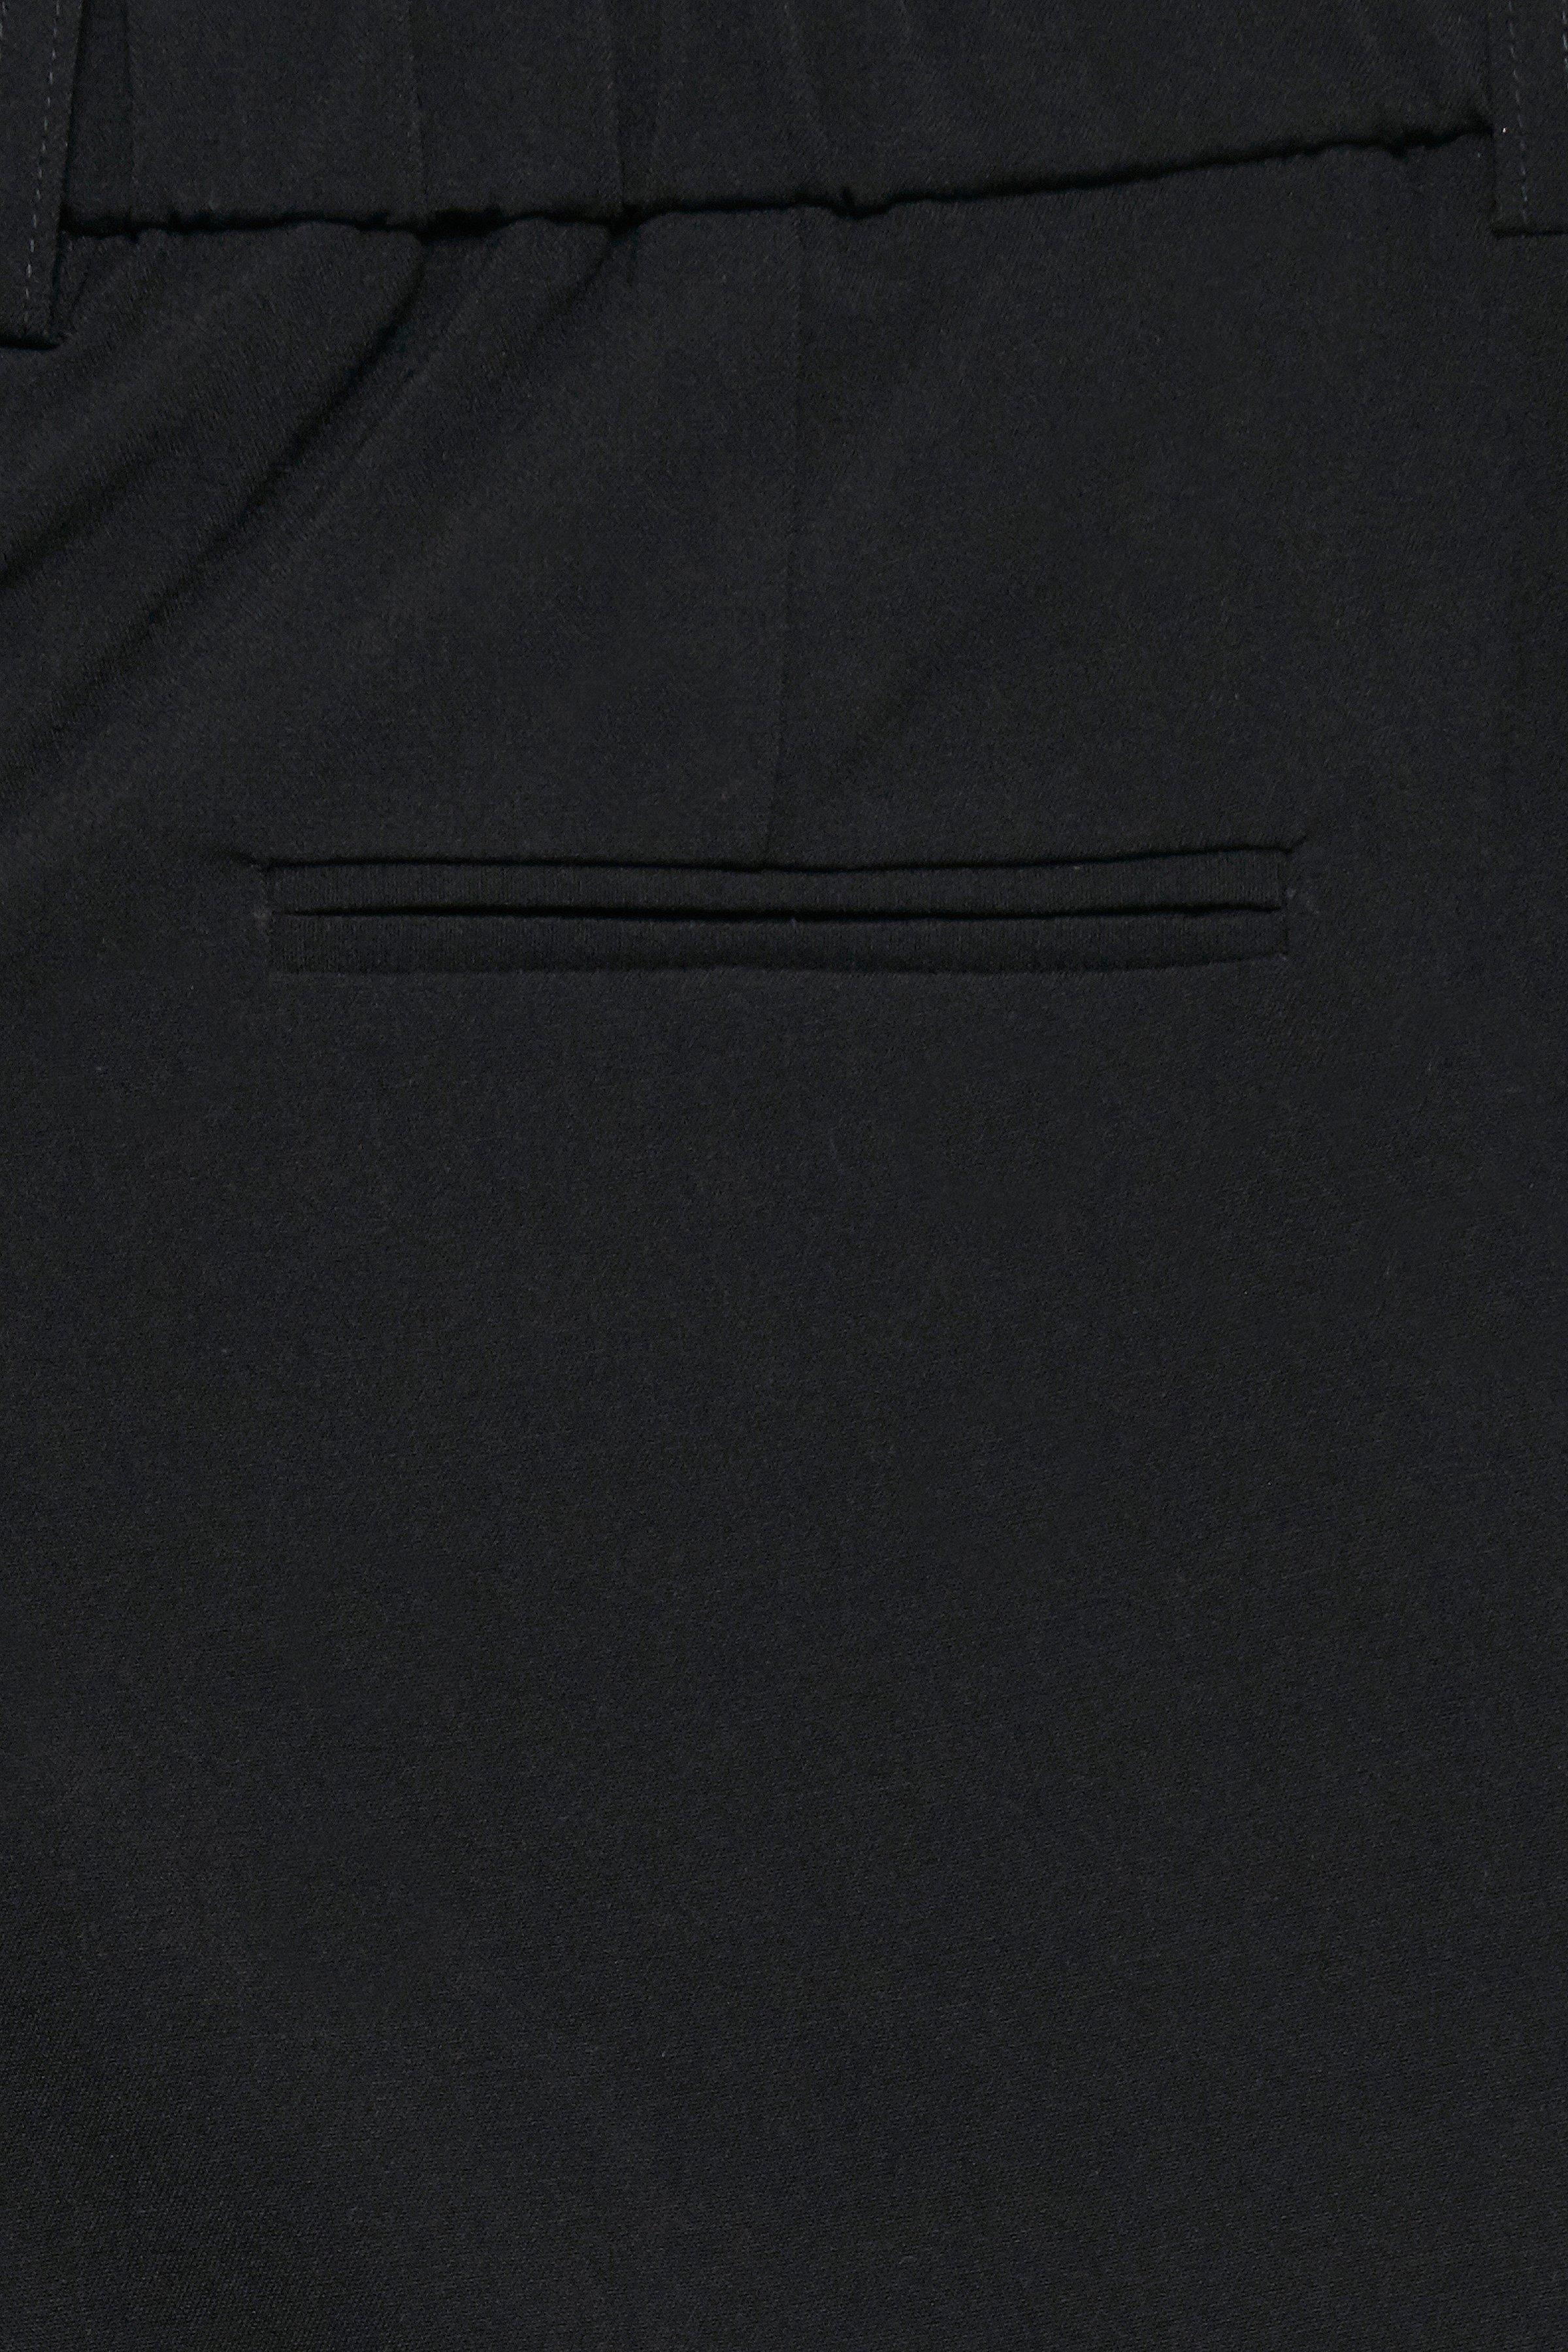 Black Pants Suiting von b.young – Kaufen Sie Black Pants Suiting aus Größe 36-46 hier